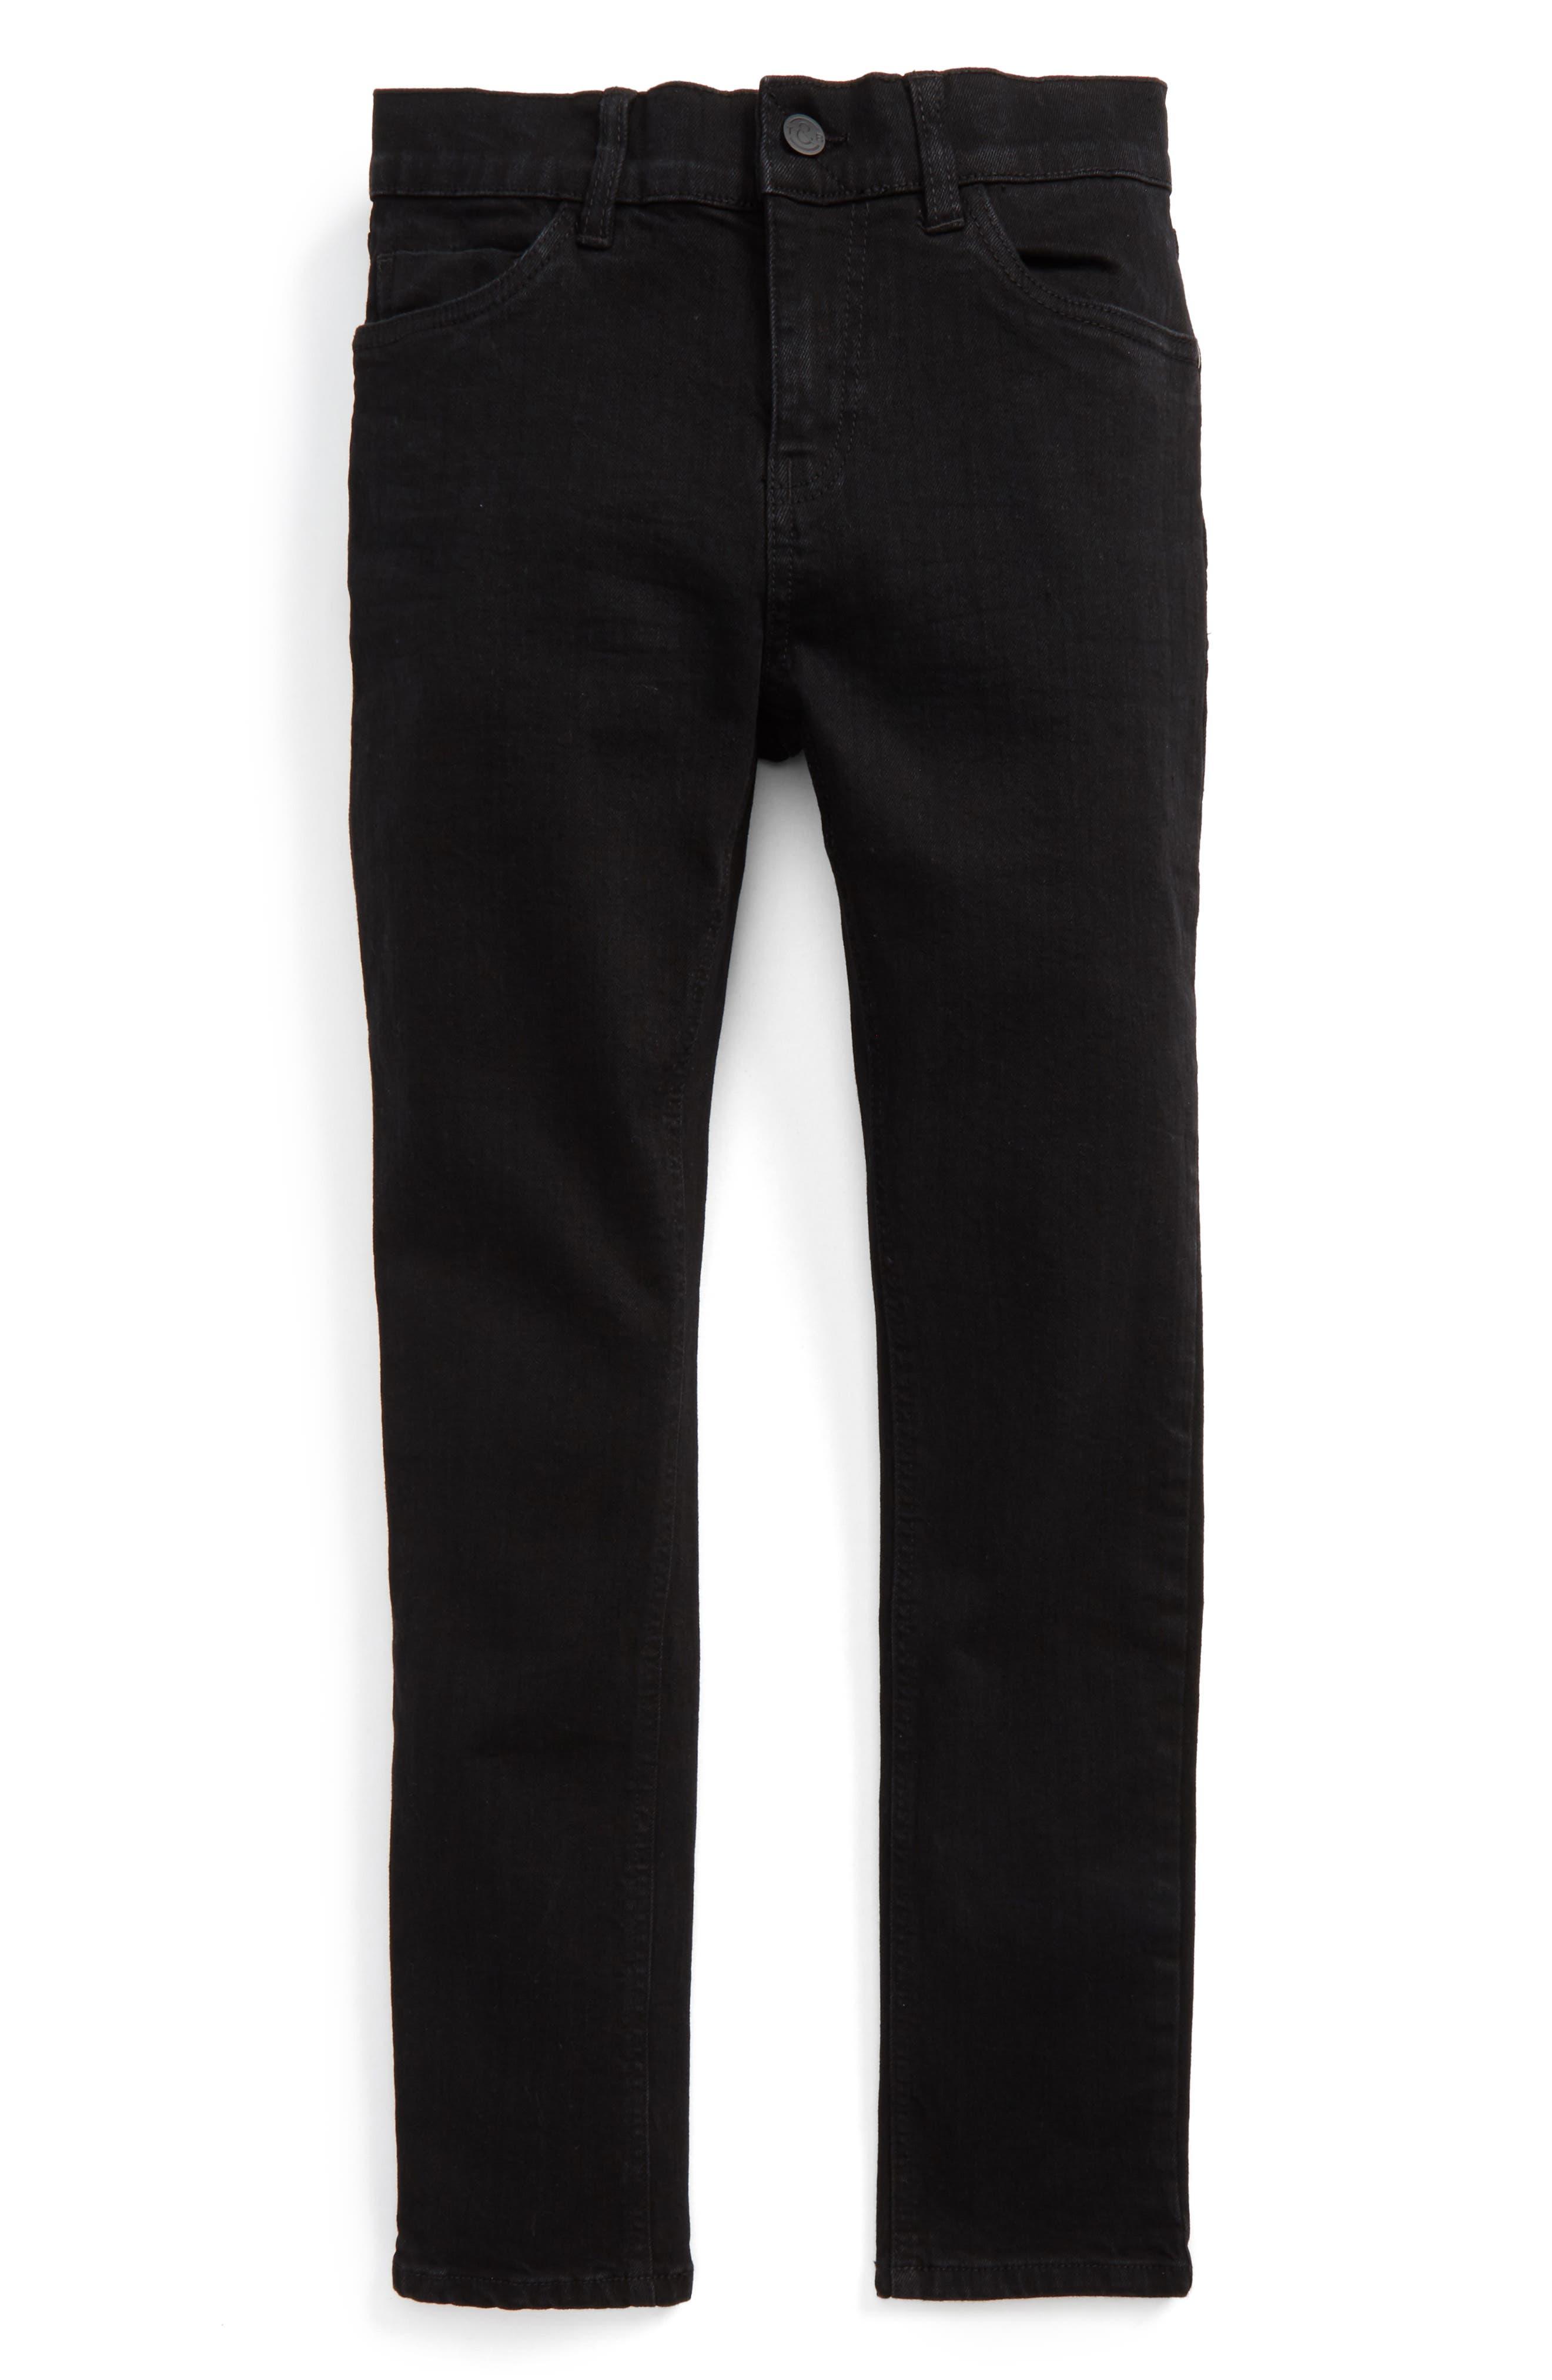 Treasure & Bond Slouch Skinny Jeans (Big Boys)